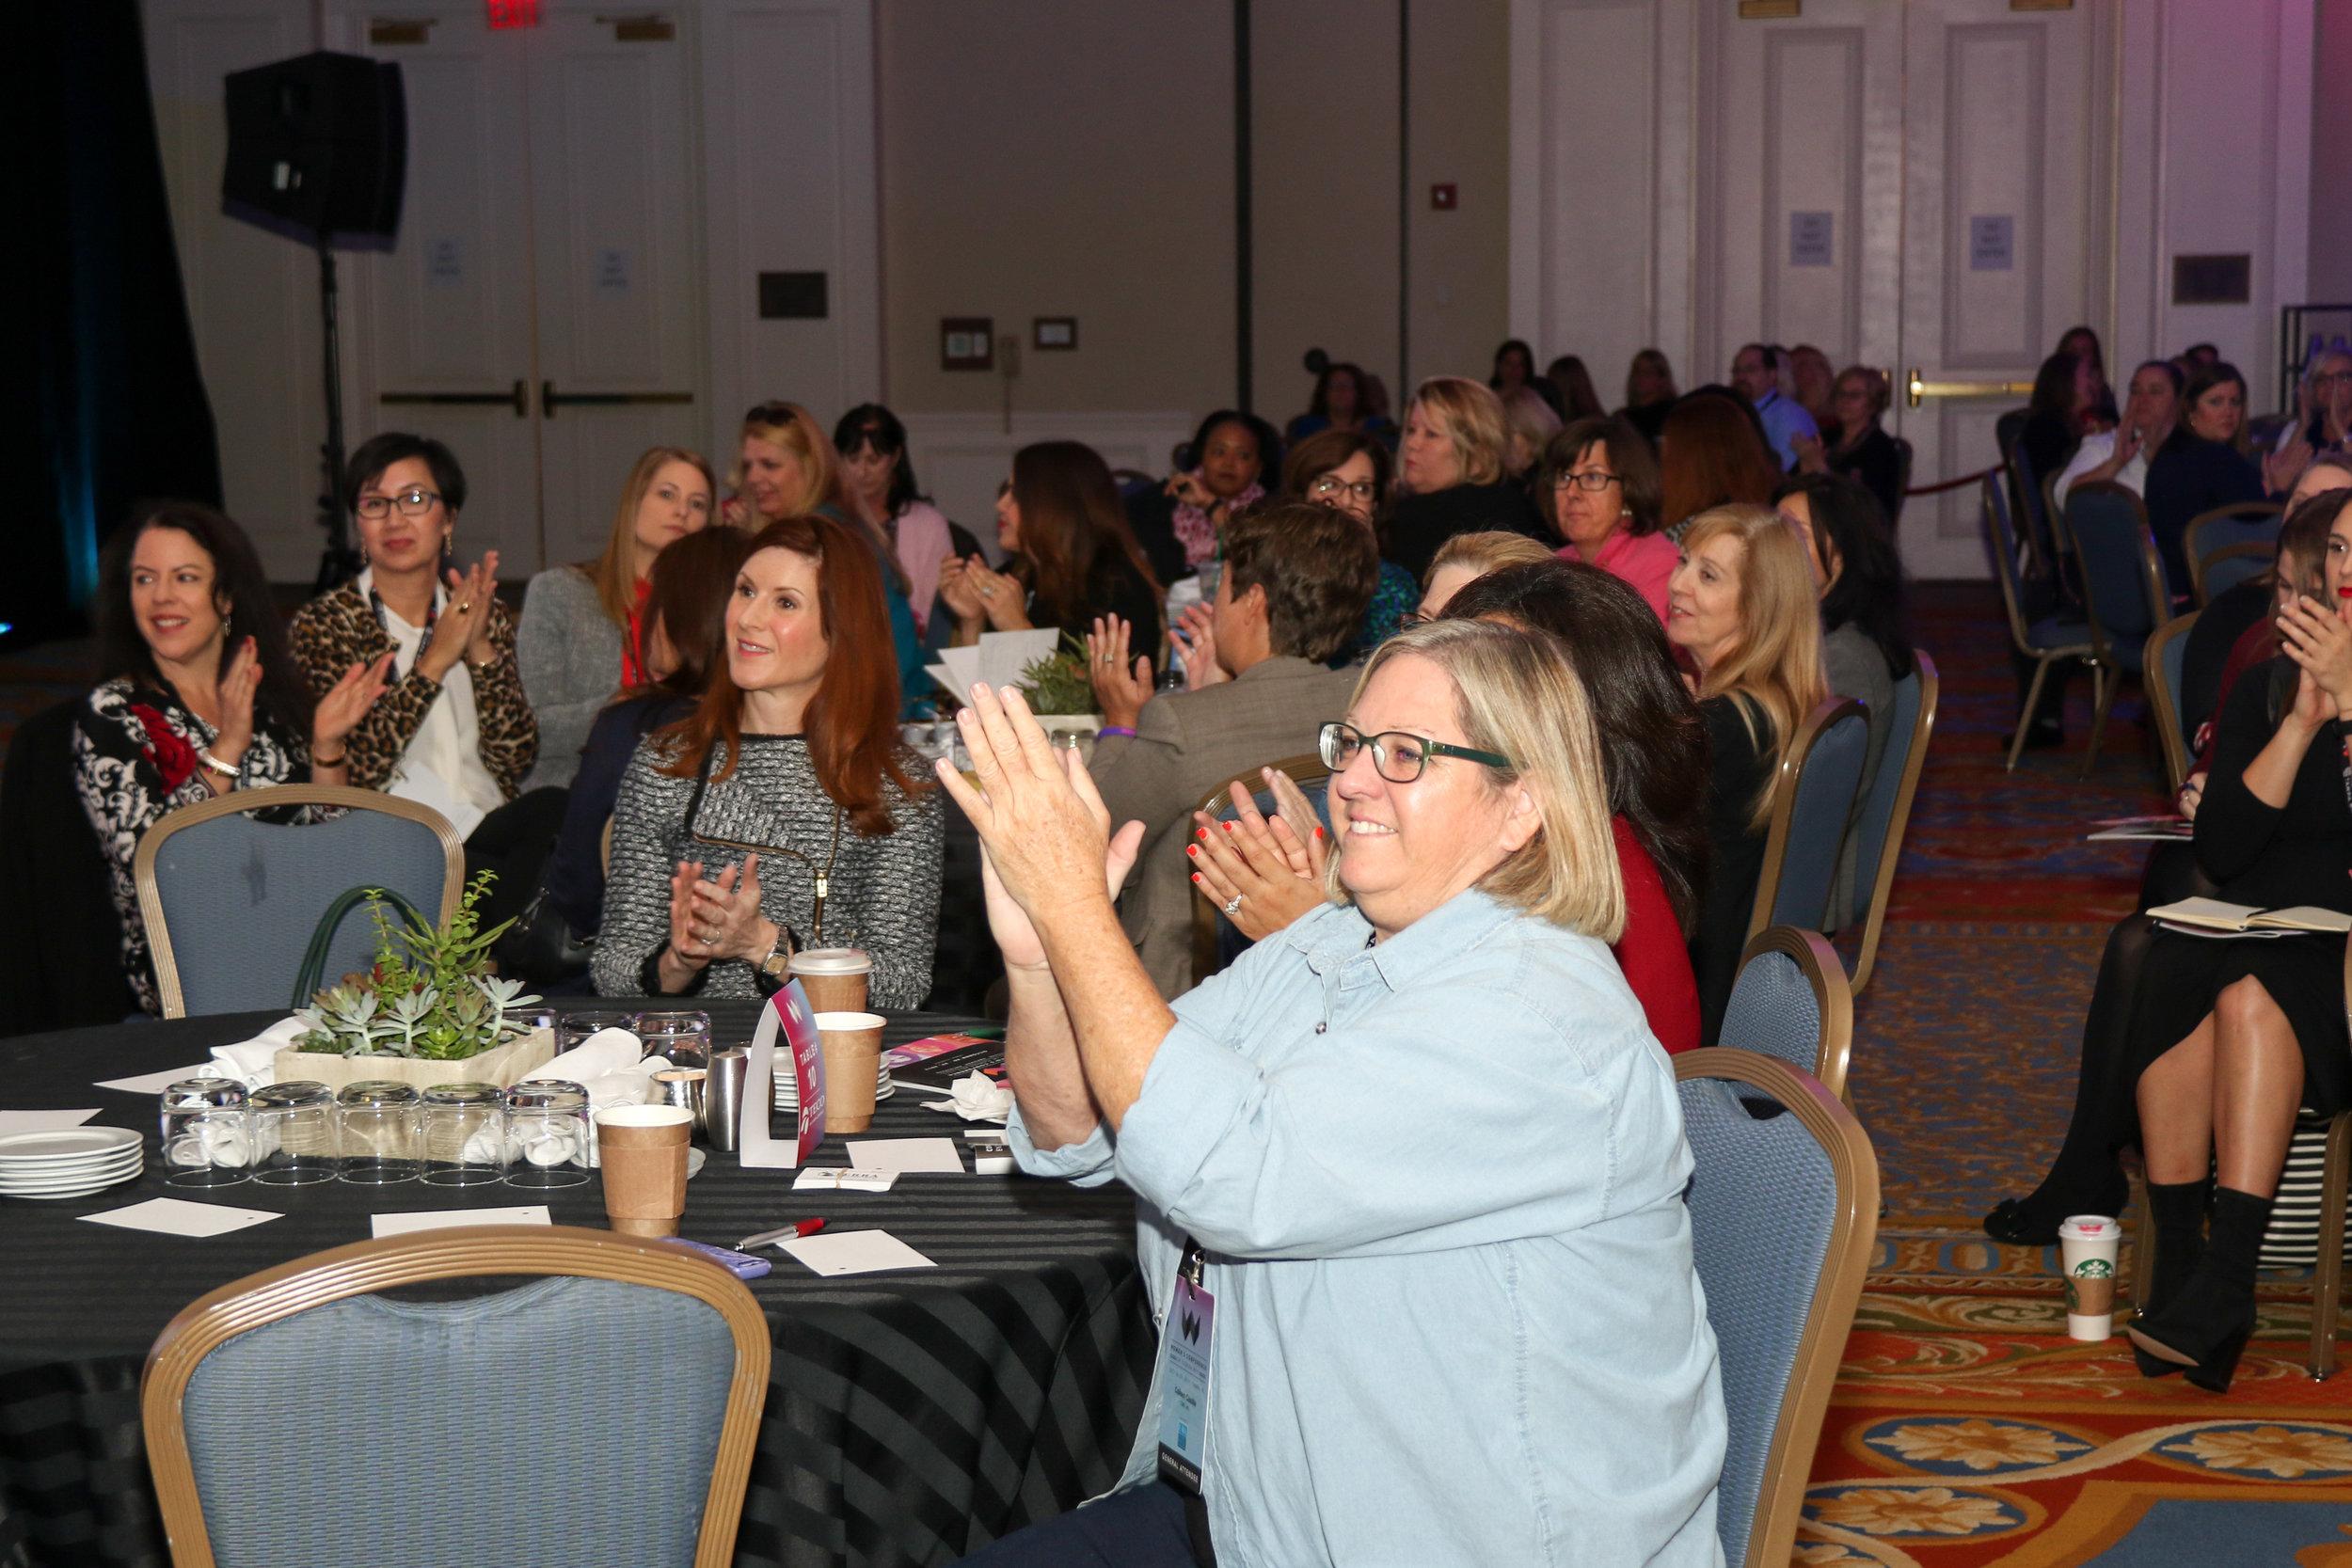 504_WomensConference_10-27-17.jpg